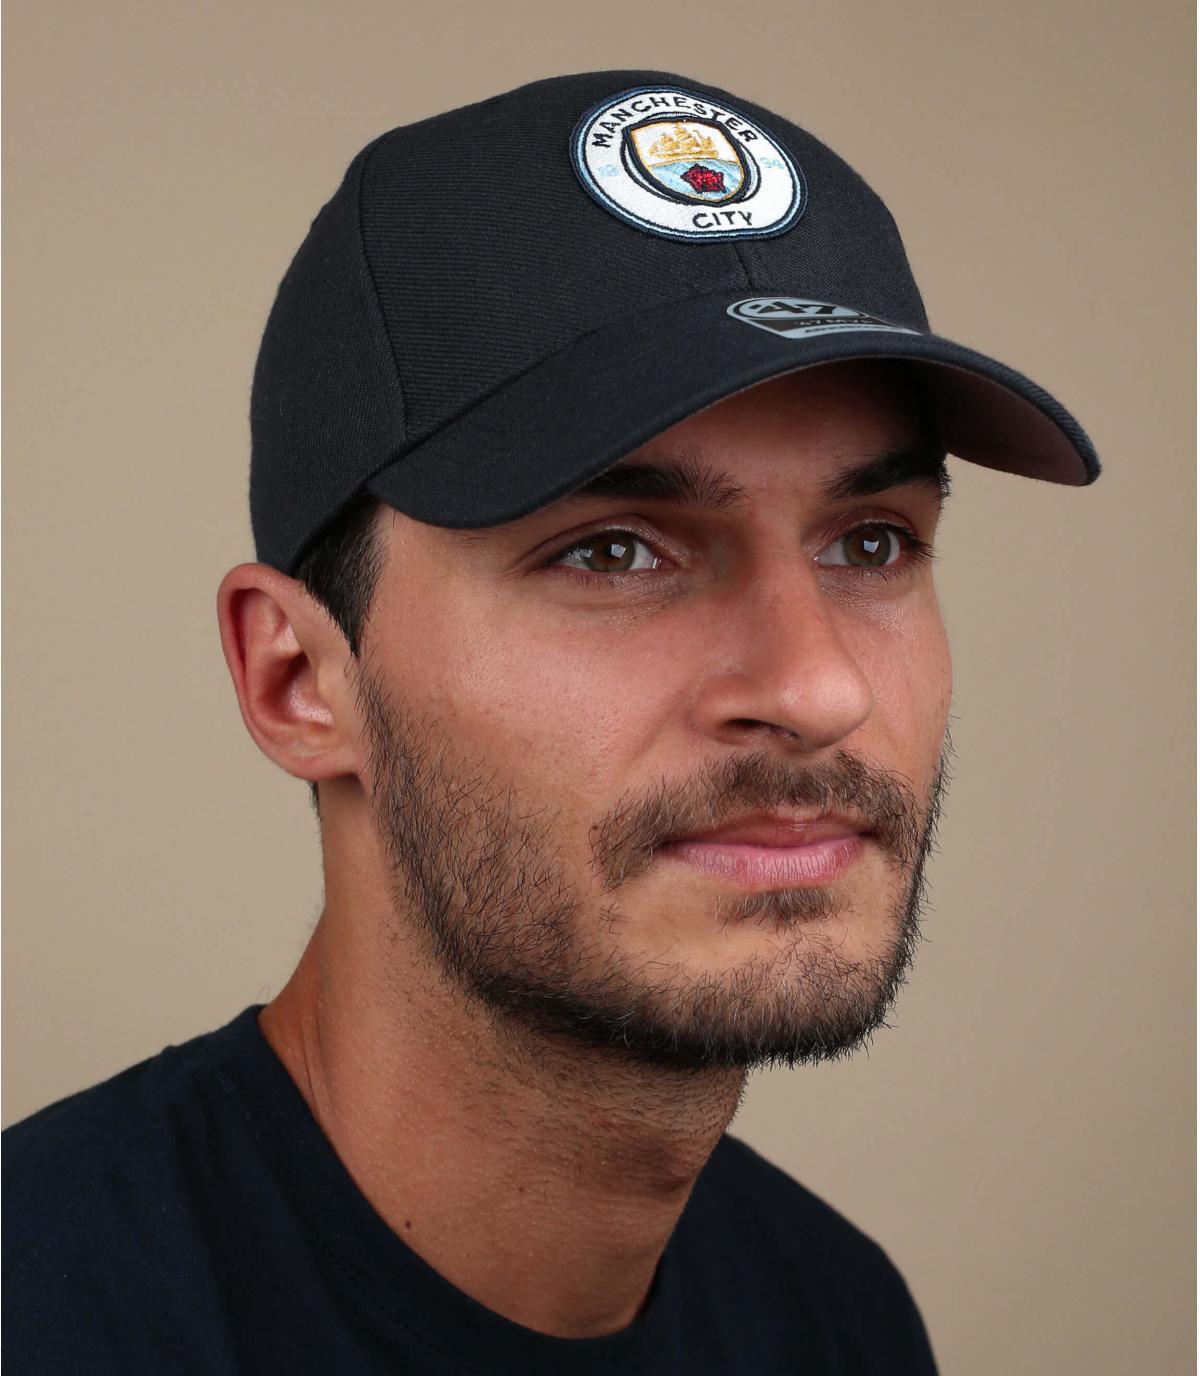 Manchester City FC cap